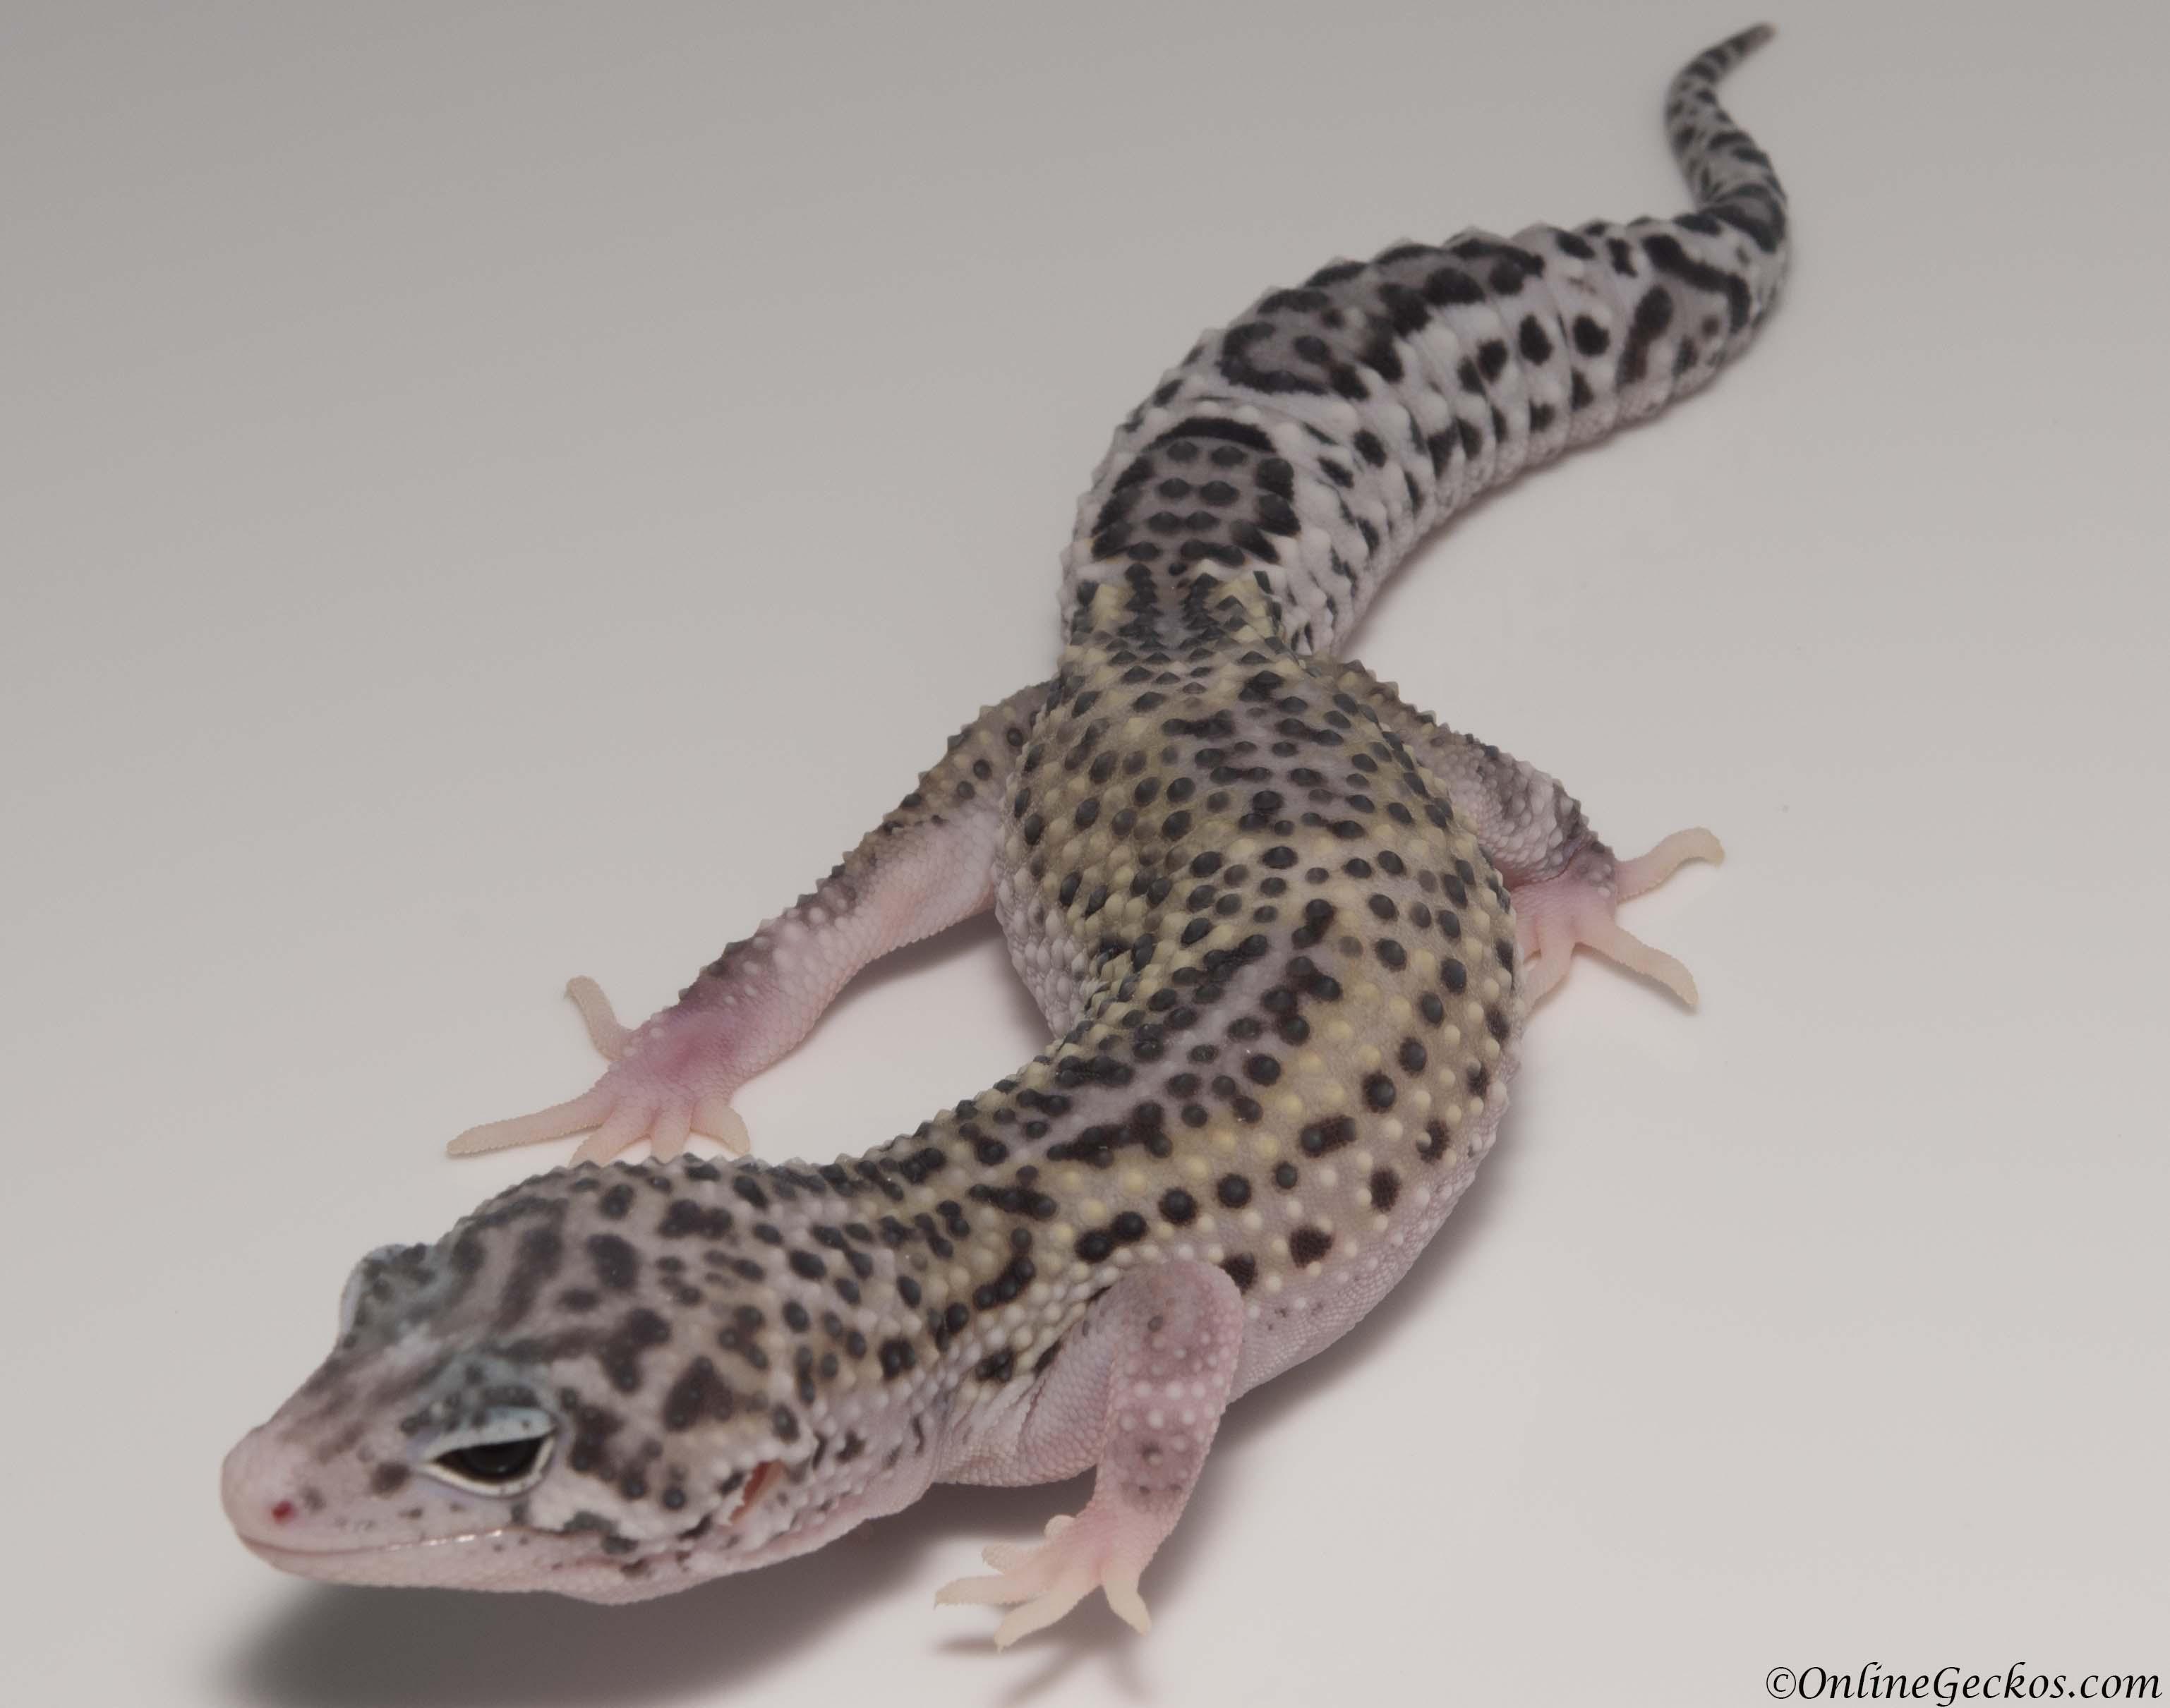 Leopard Gecko Breeding Breeder Chronicle - OnlineGeckos ...Leopard Gecko Hatchling